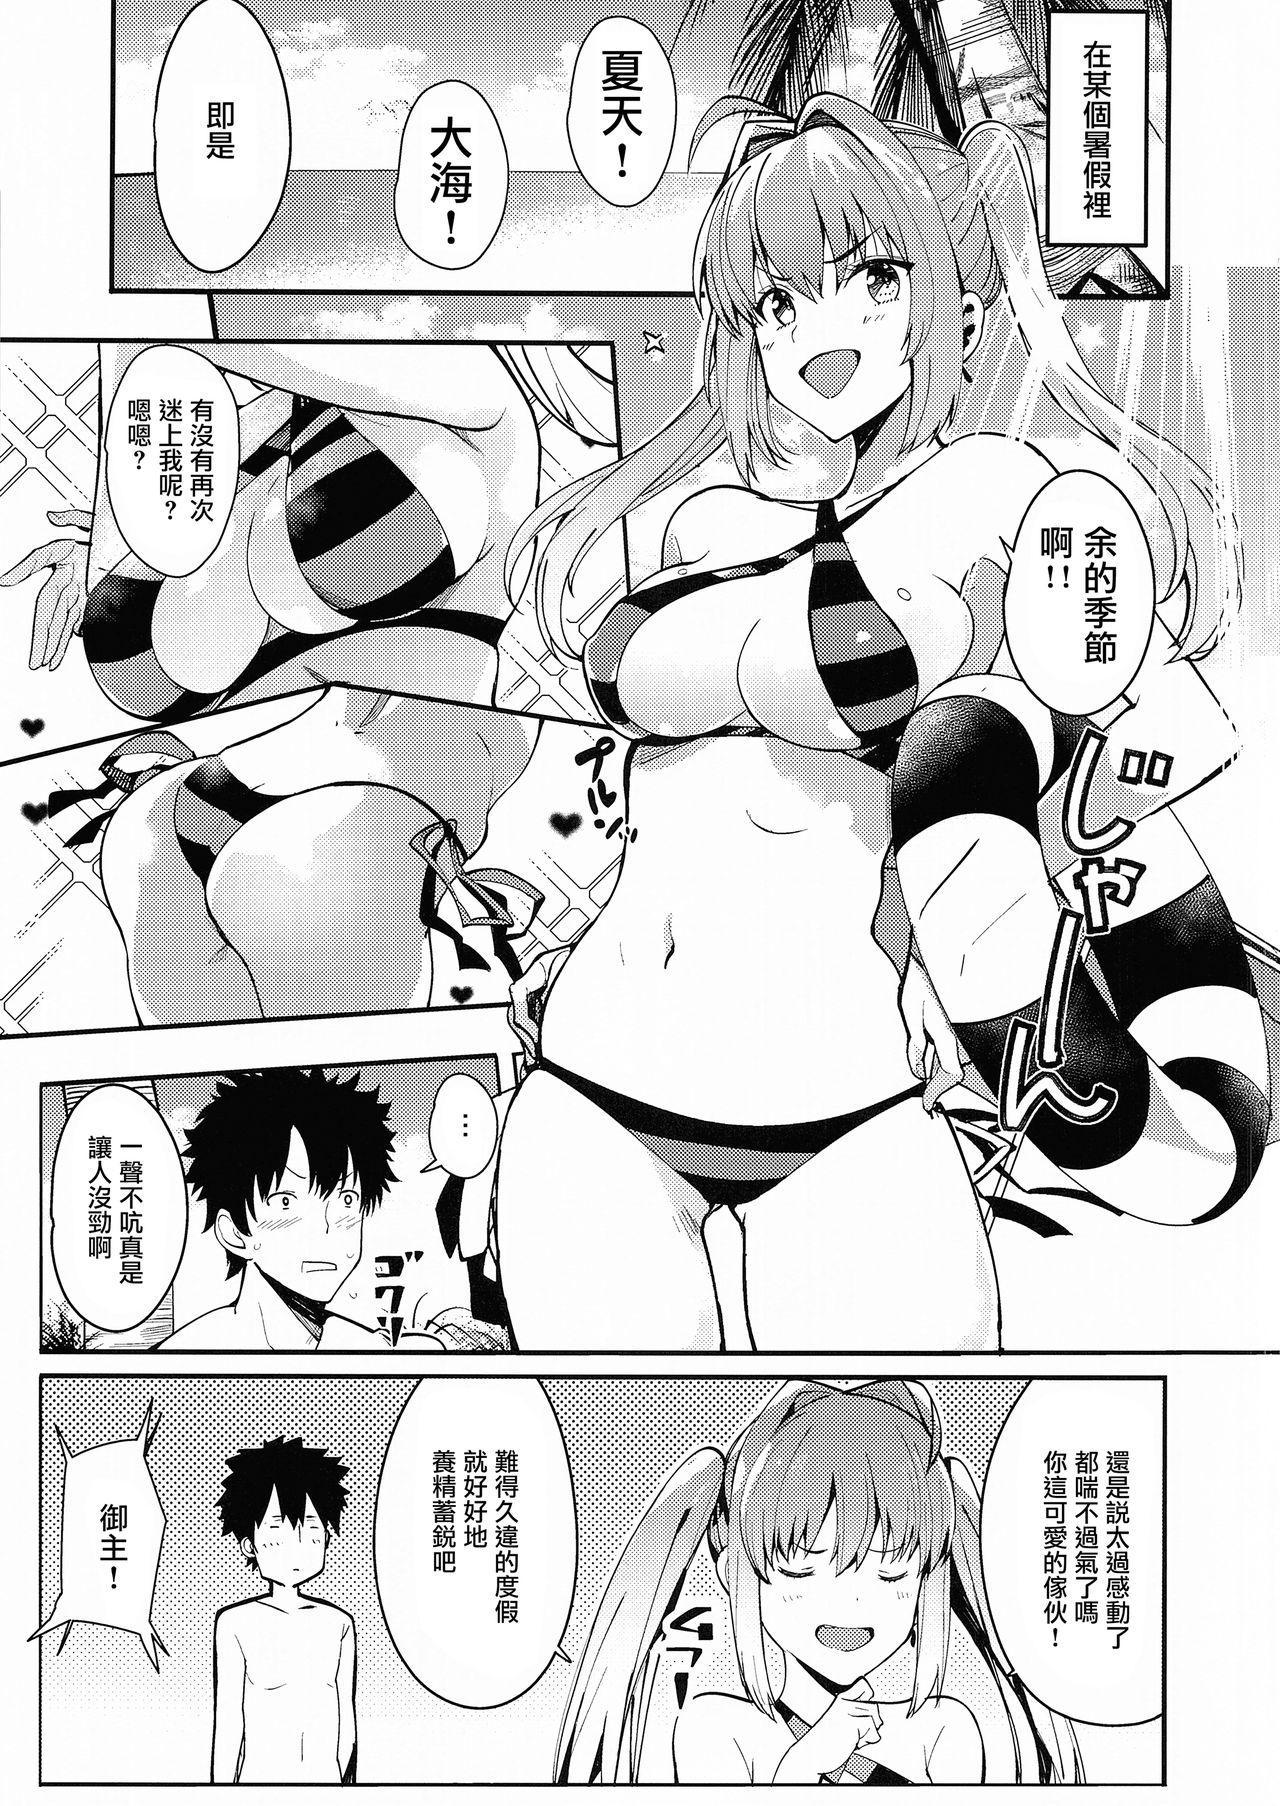 Nero to 2